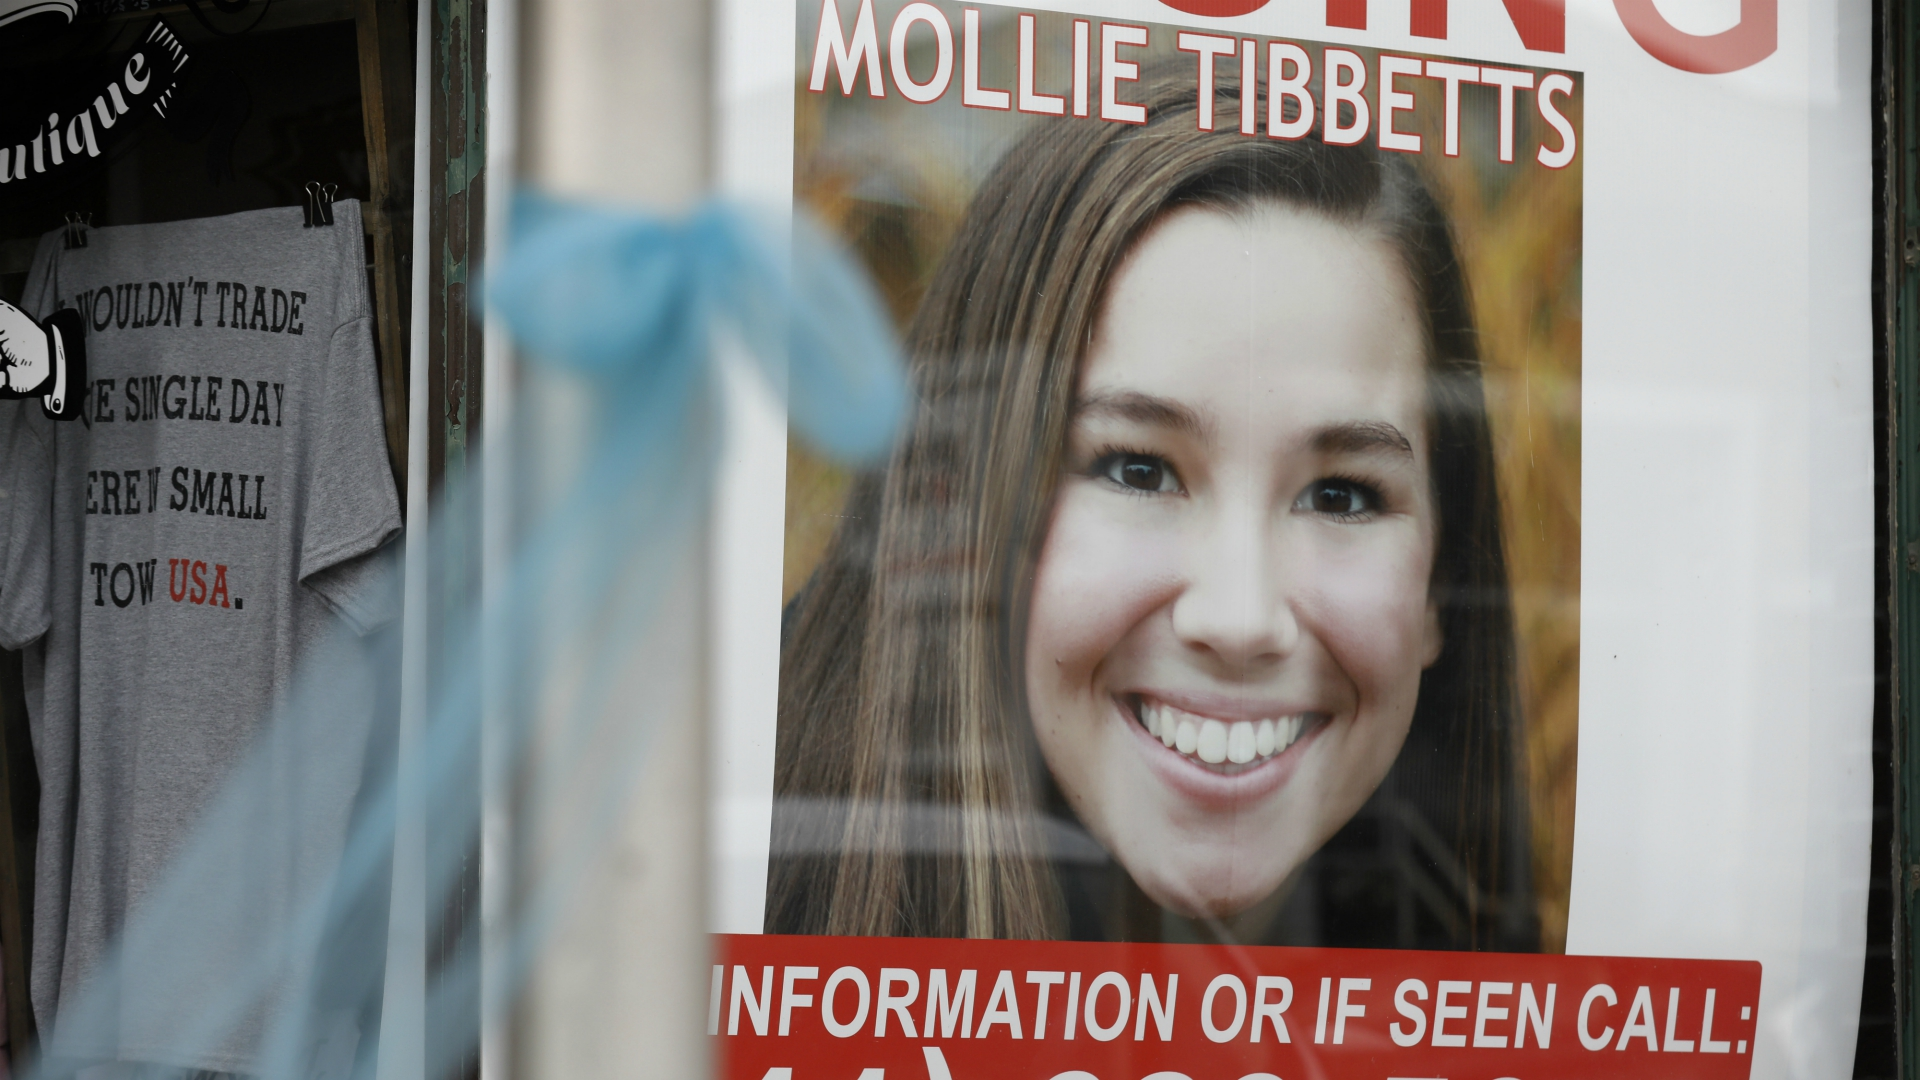 mollie tibbetts 082118 AP_1534889808334.jpg.jpg